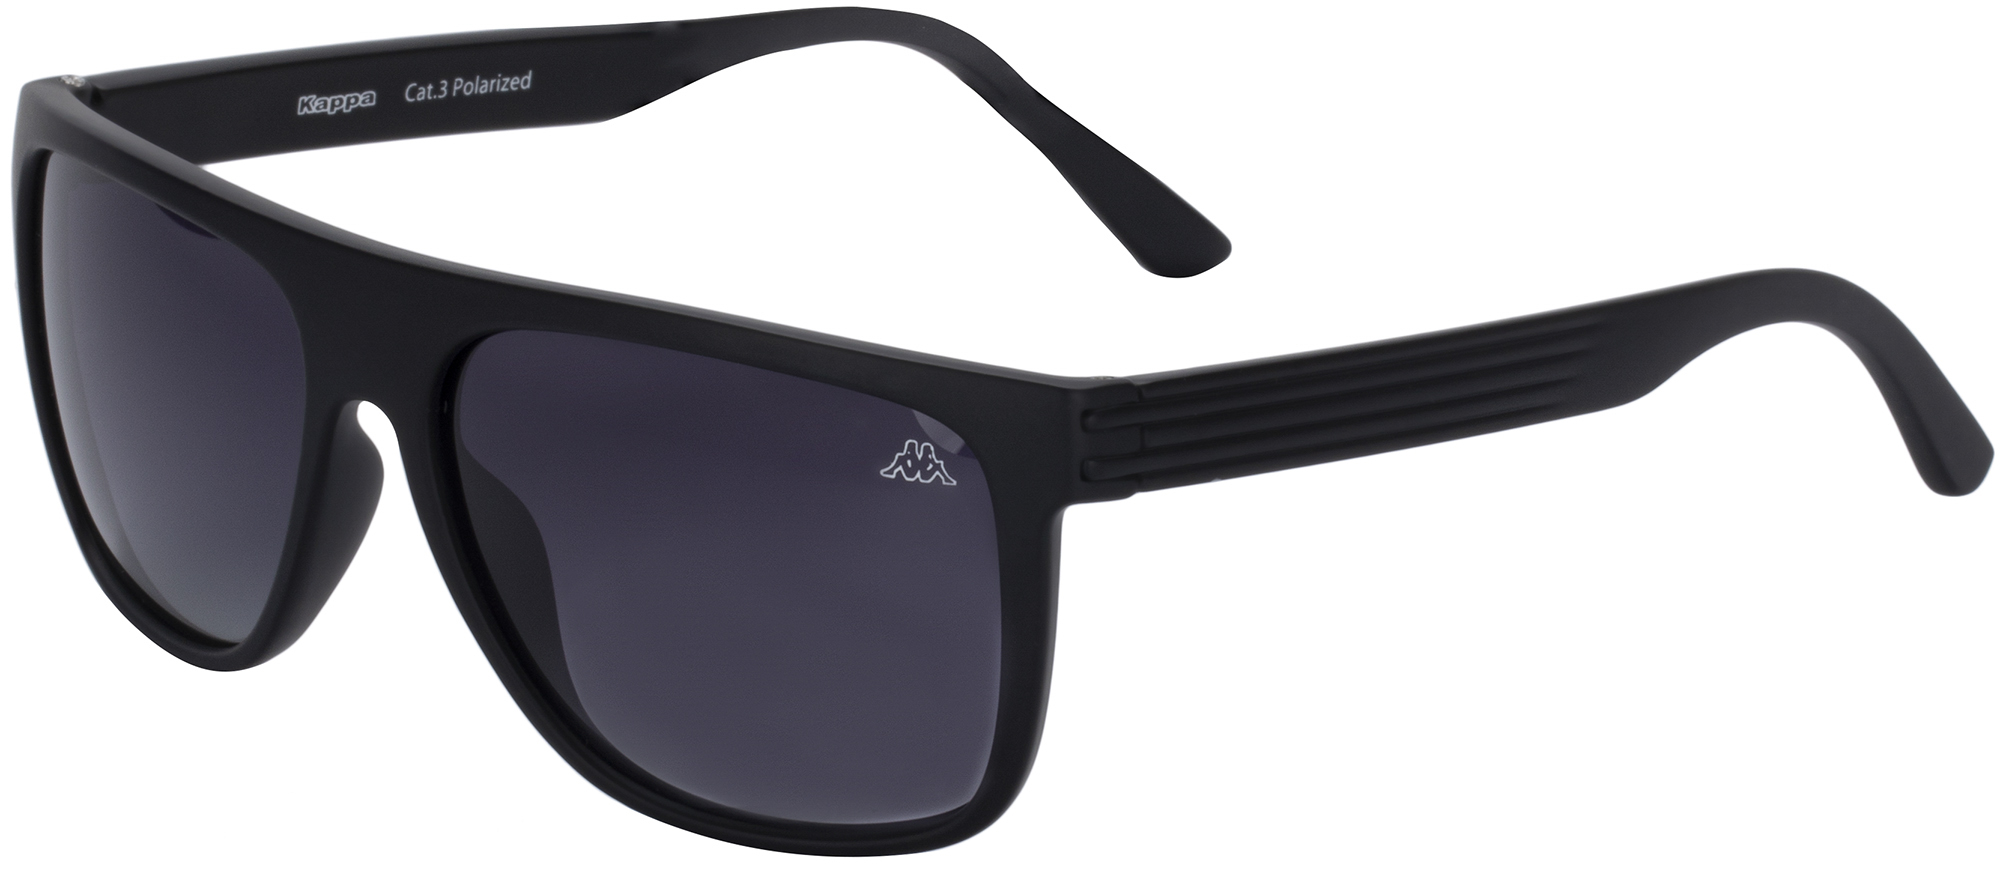 цены Kappa Солнцезащитные очки Kappa